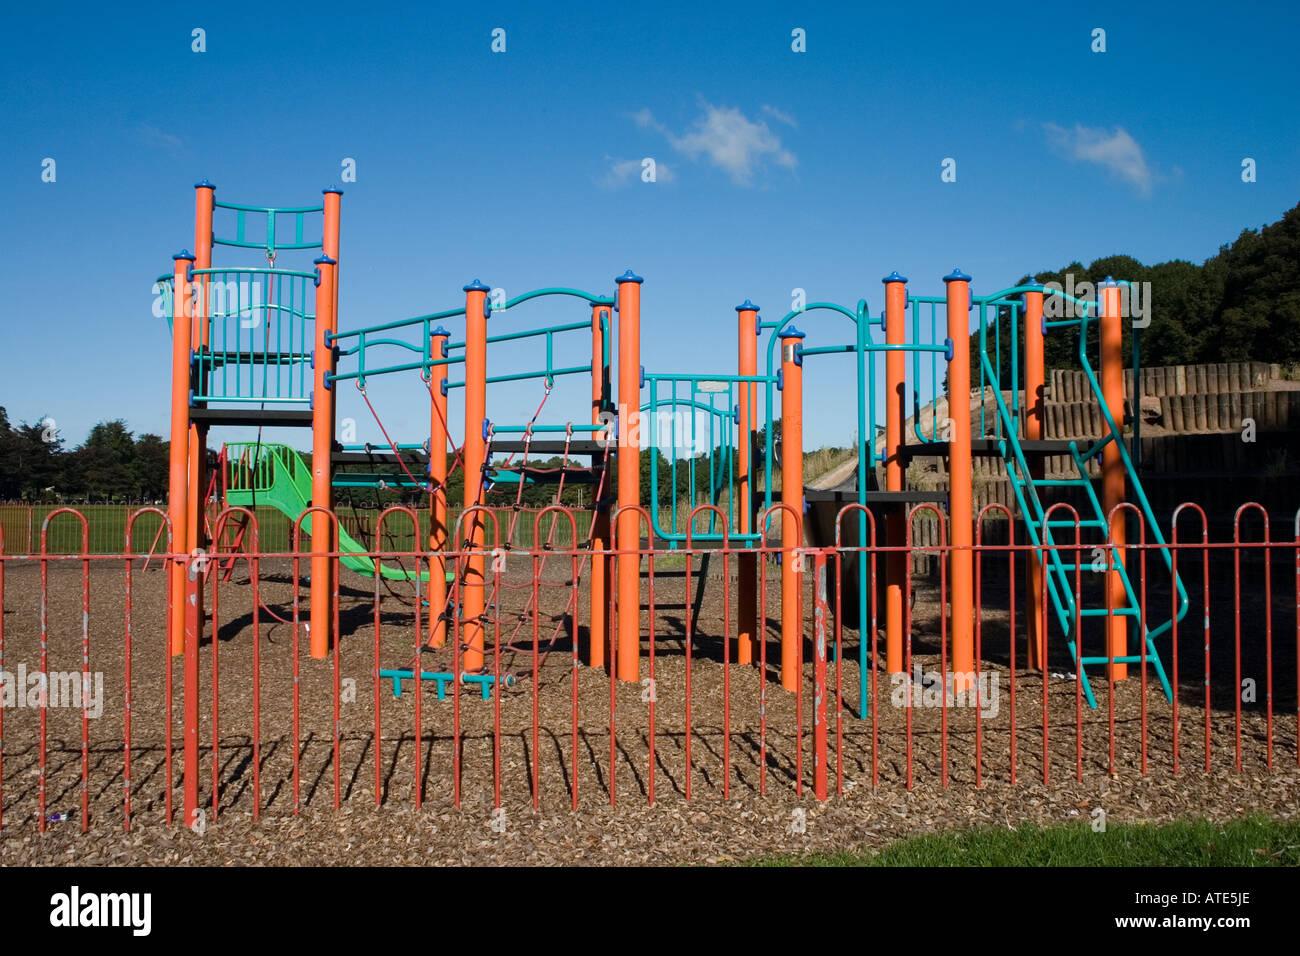 Roath recreation ground